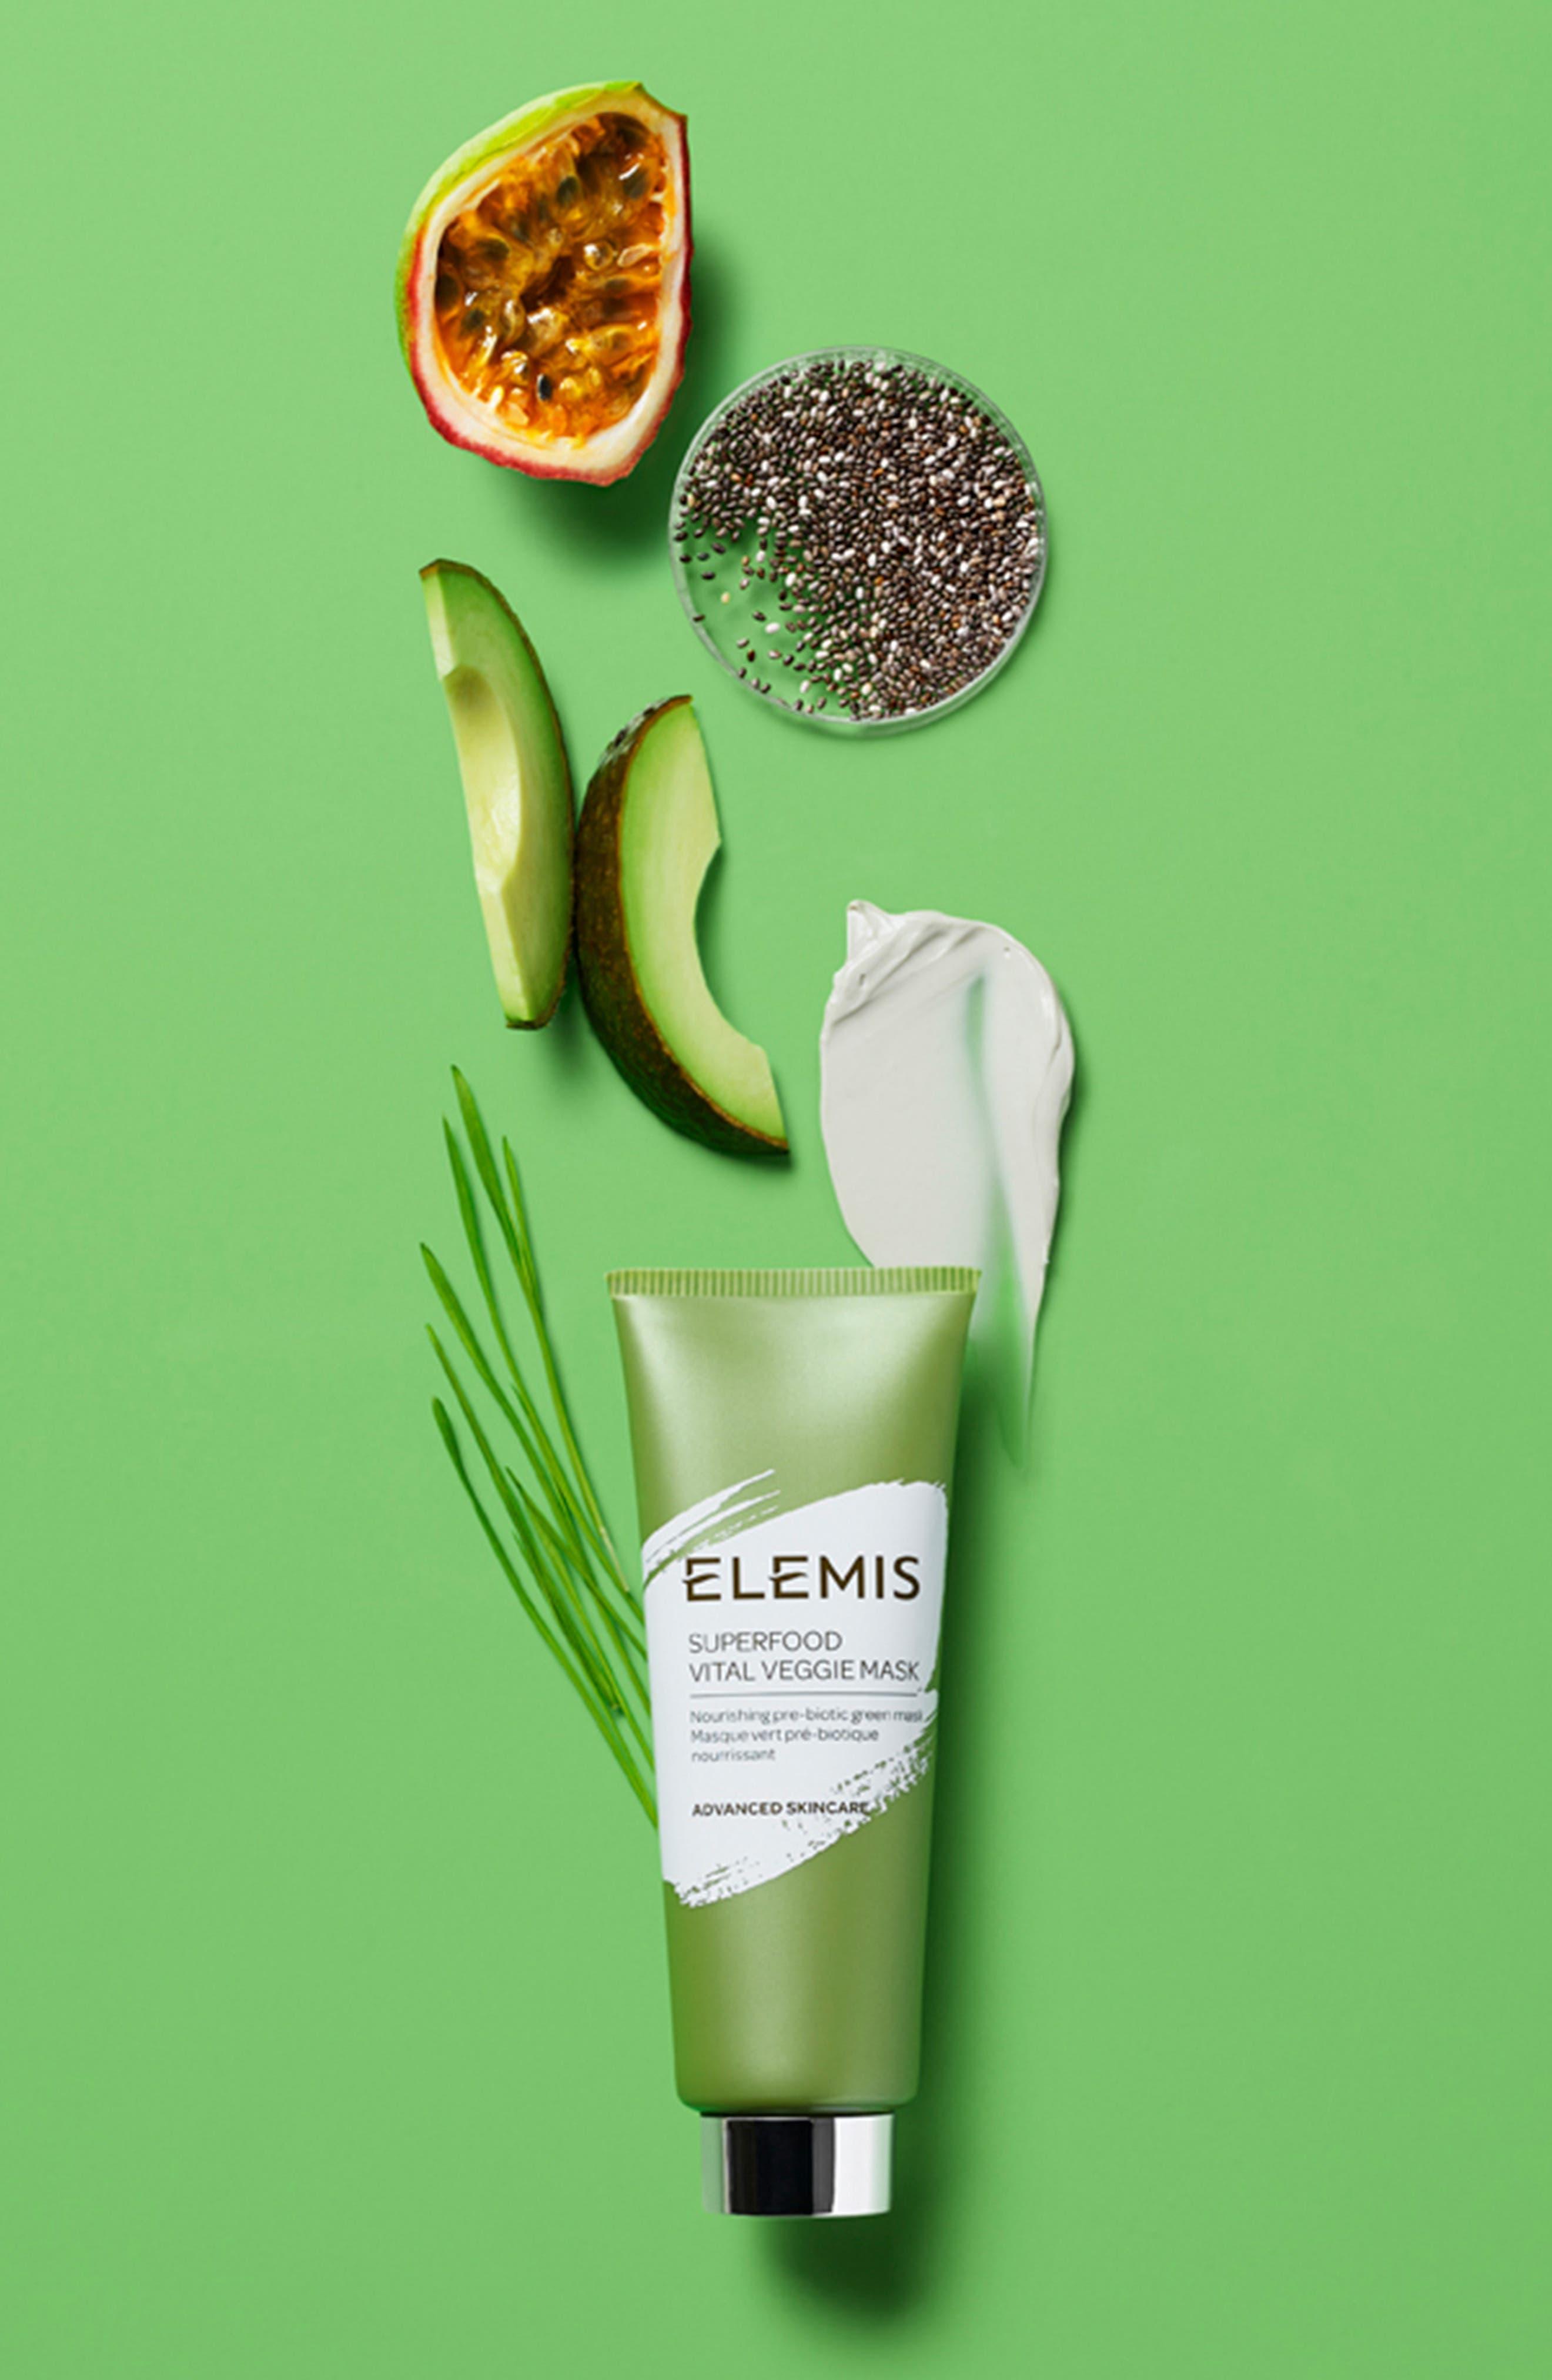 ELEMIS, Superfood Vital Veggie Mask, Alternate thumbnail 3, color, NO COLOR